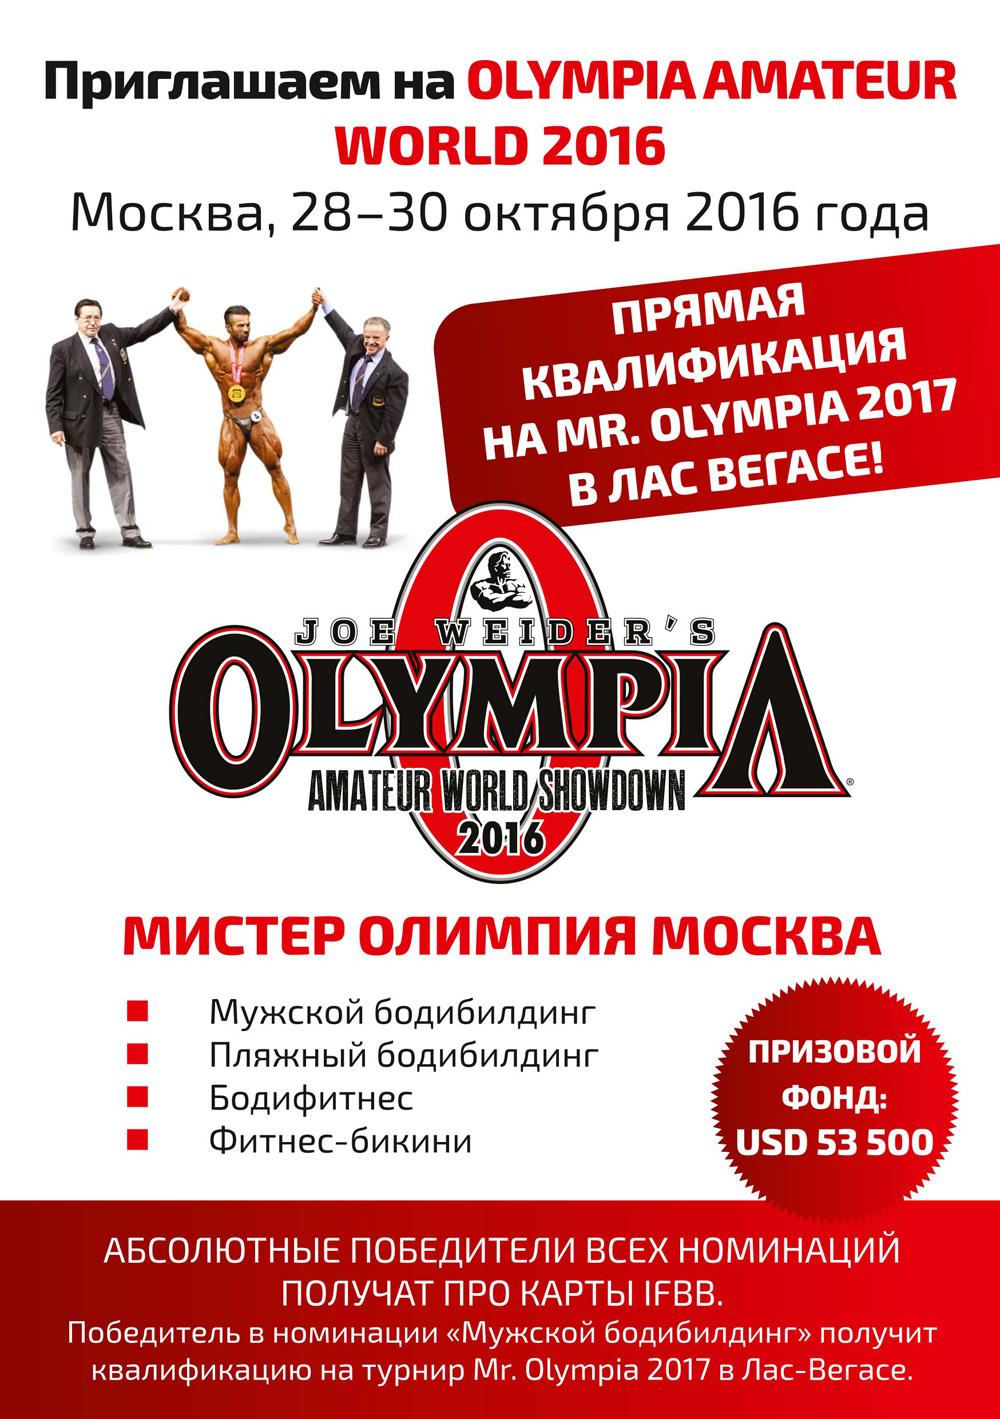 Мистер Олимпия Москва – уже третий раз в Москве